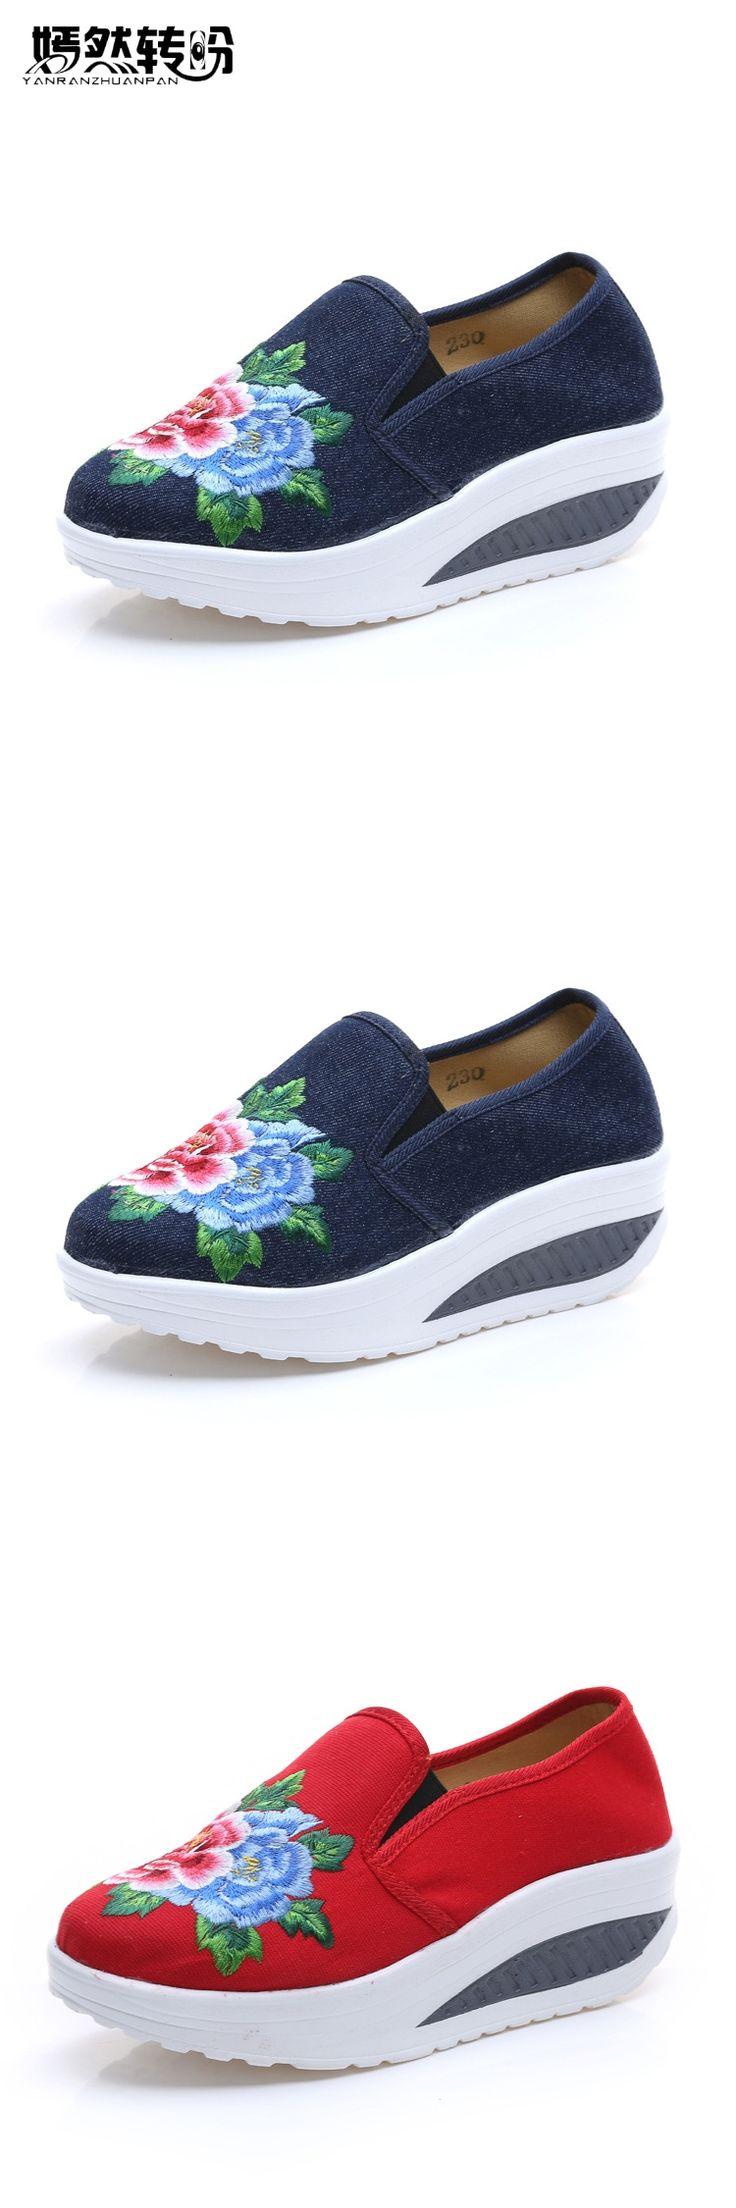 Vtota Women Flats Spring Autumn Shoes Woman Cotton Fabric Casual Shoes Woman Bre